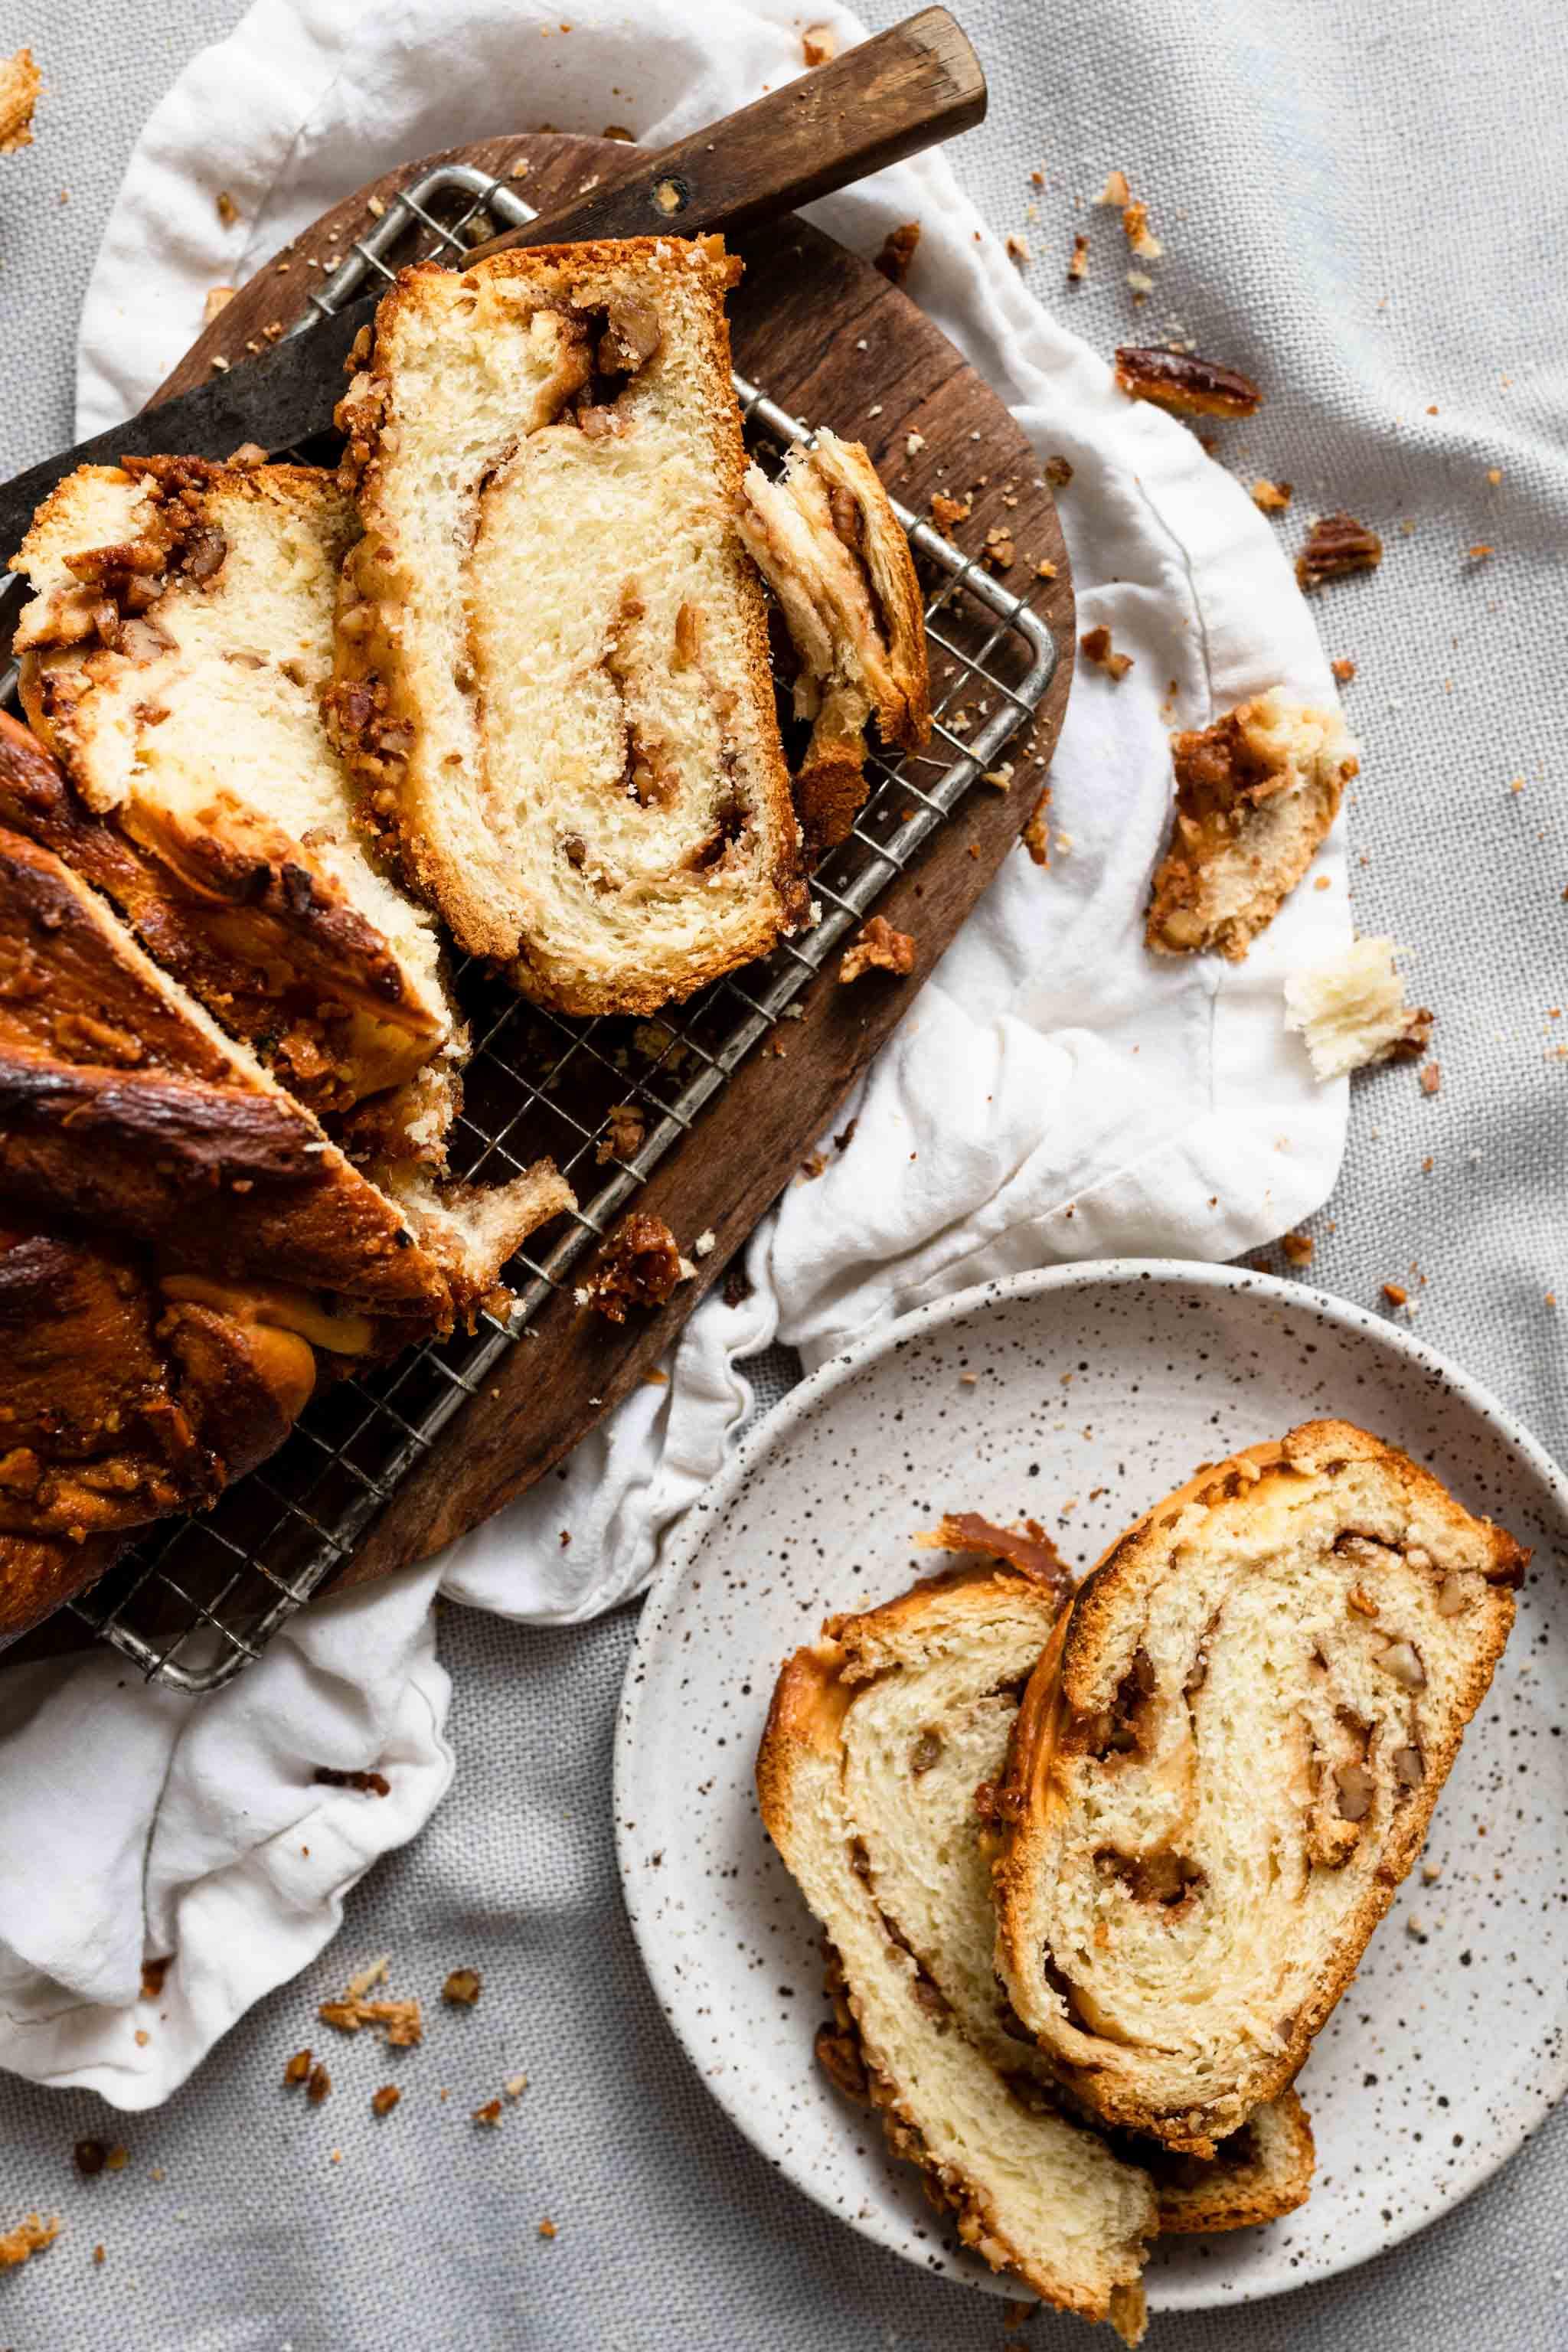 Sliced babka recipe loaf with caramel and butterscotch